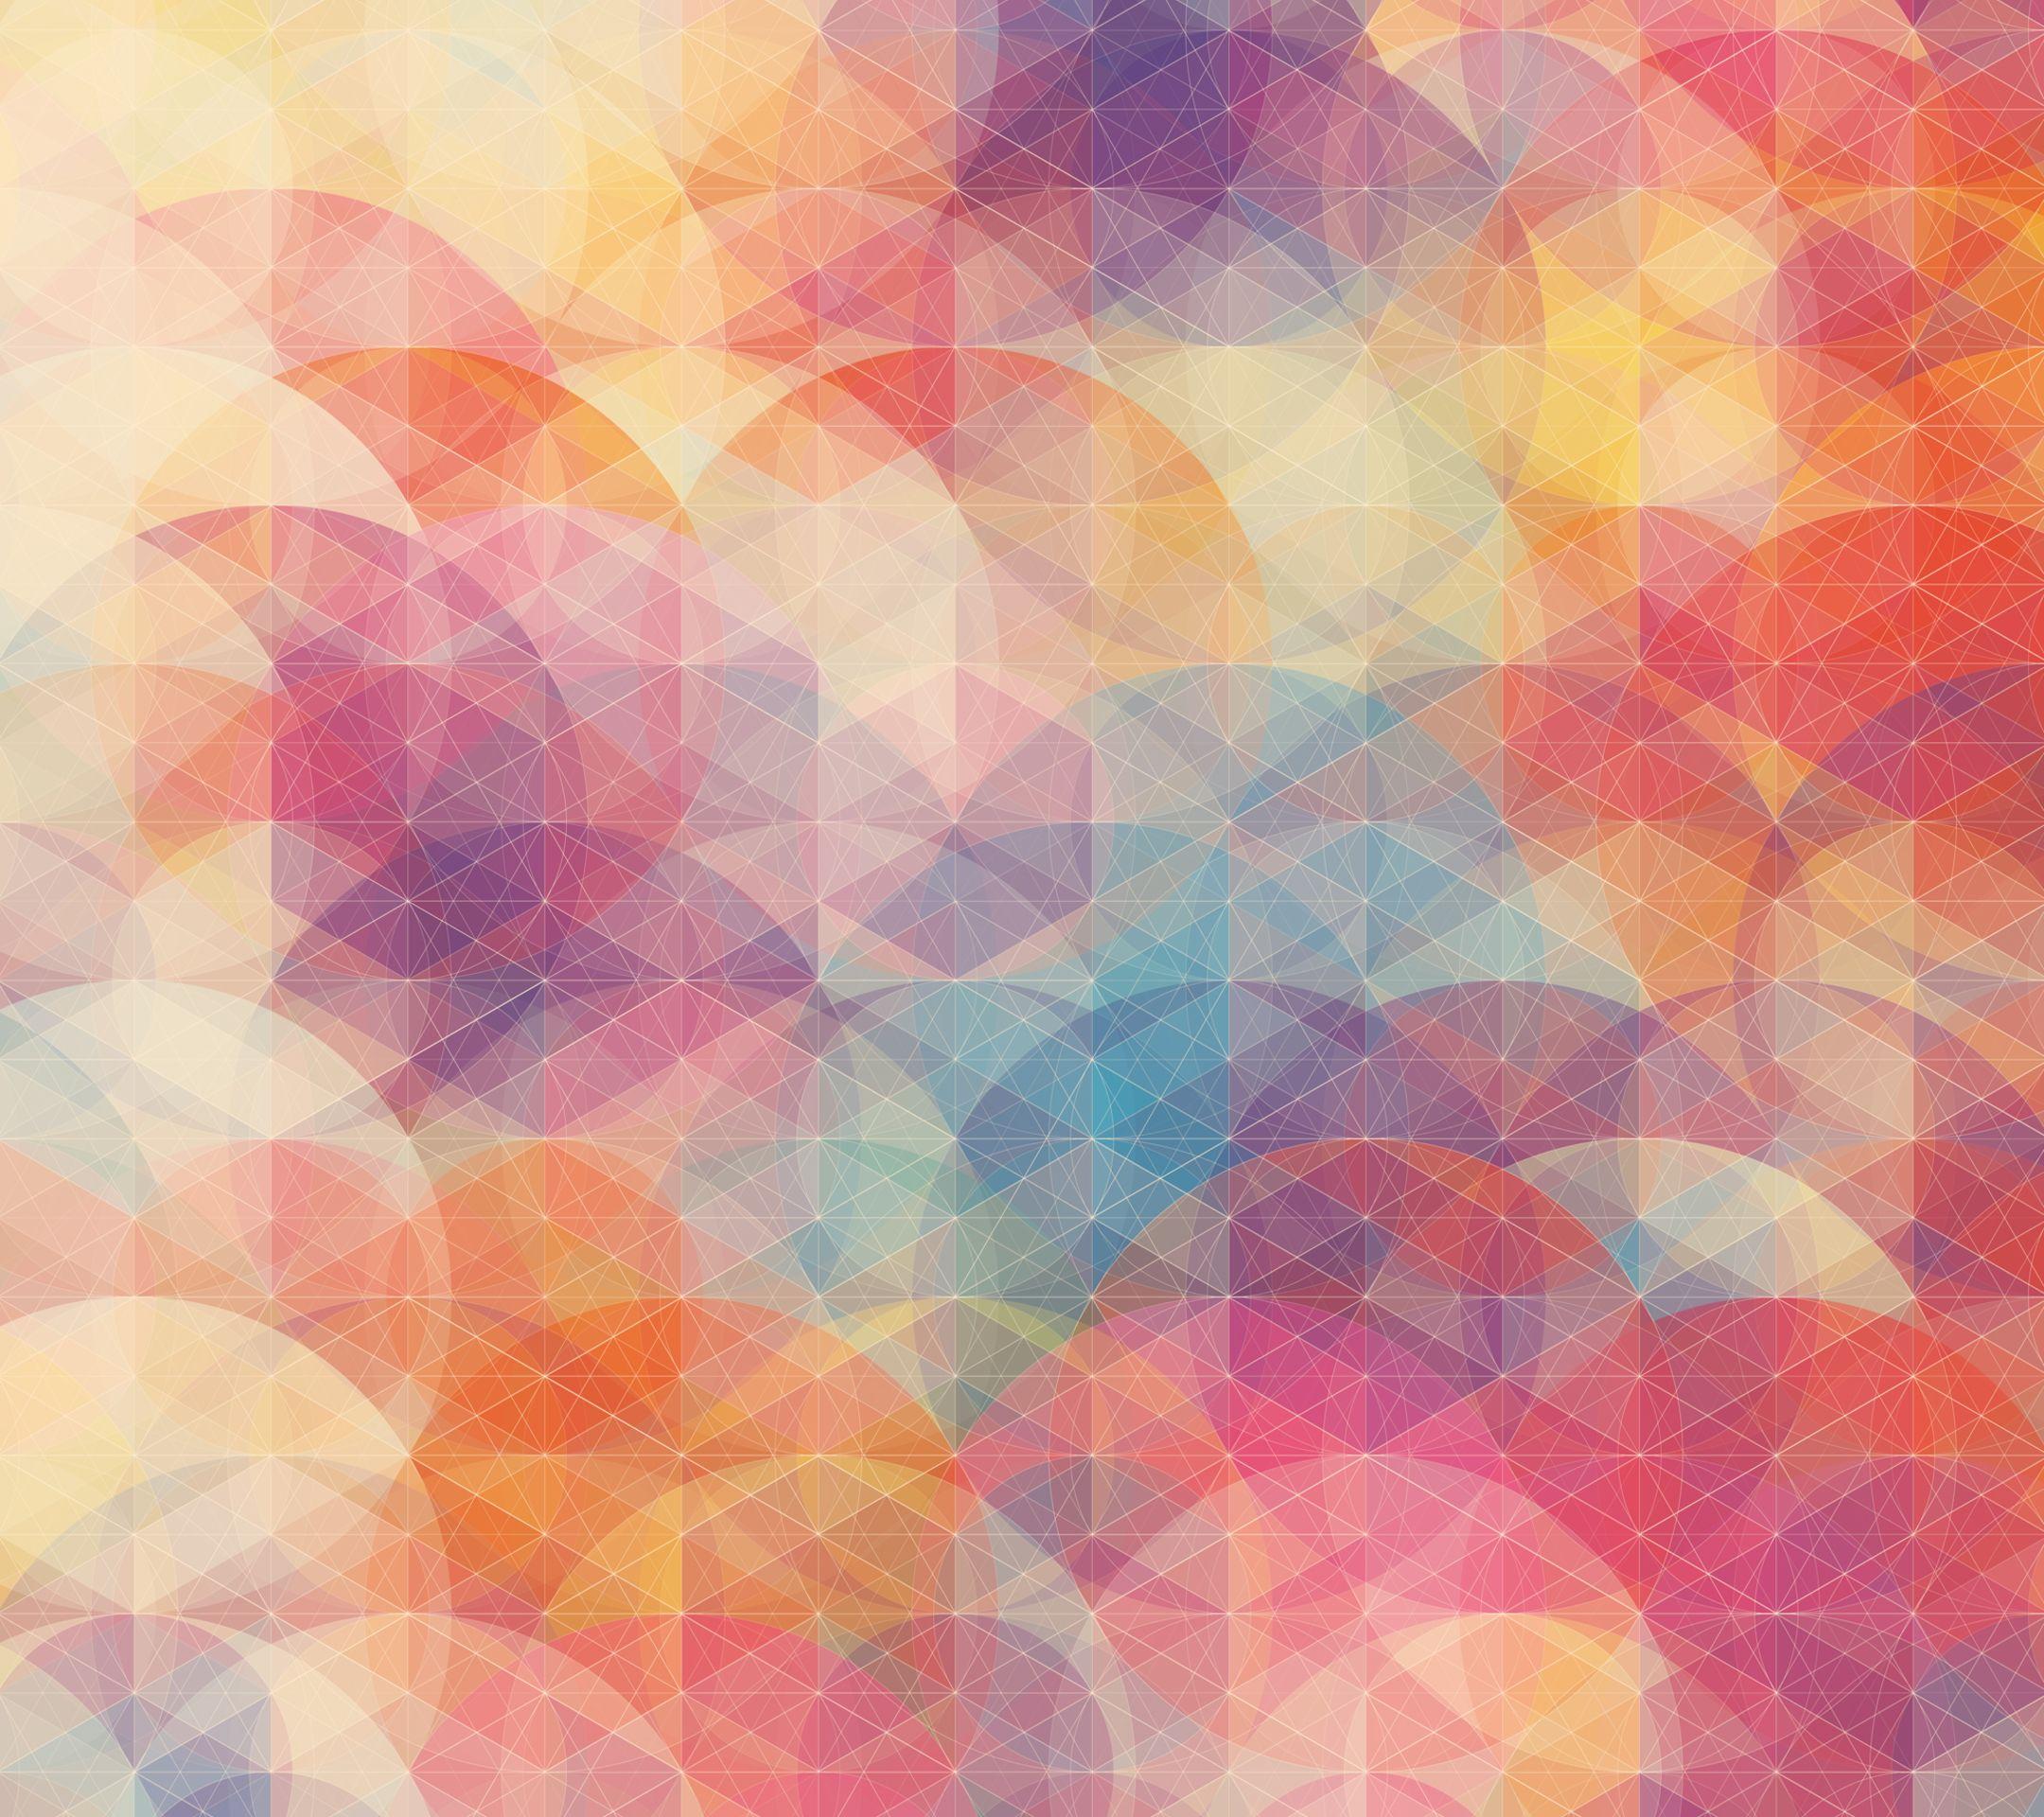 My-Sony-Xperia-Z-Wallpaper-HD-Patterns_3.jpg (2160×1920